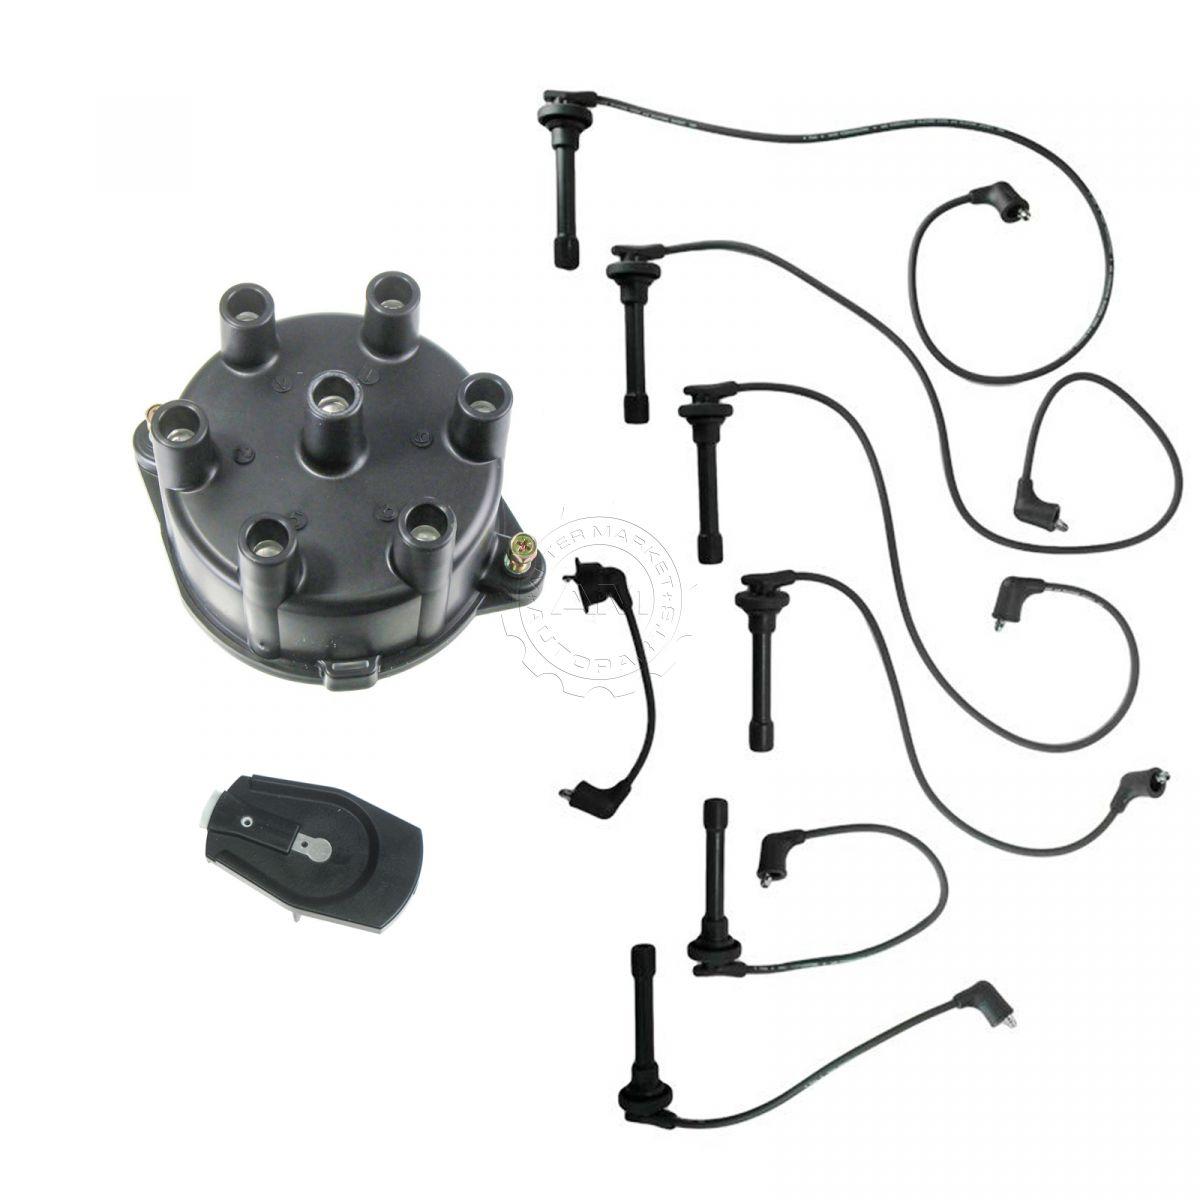 Plug Wires Distributor Cap & Rotor Kit for 95-97 Accord 2.7 | eBay